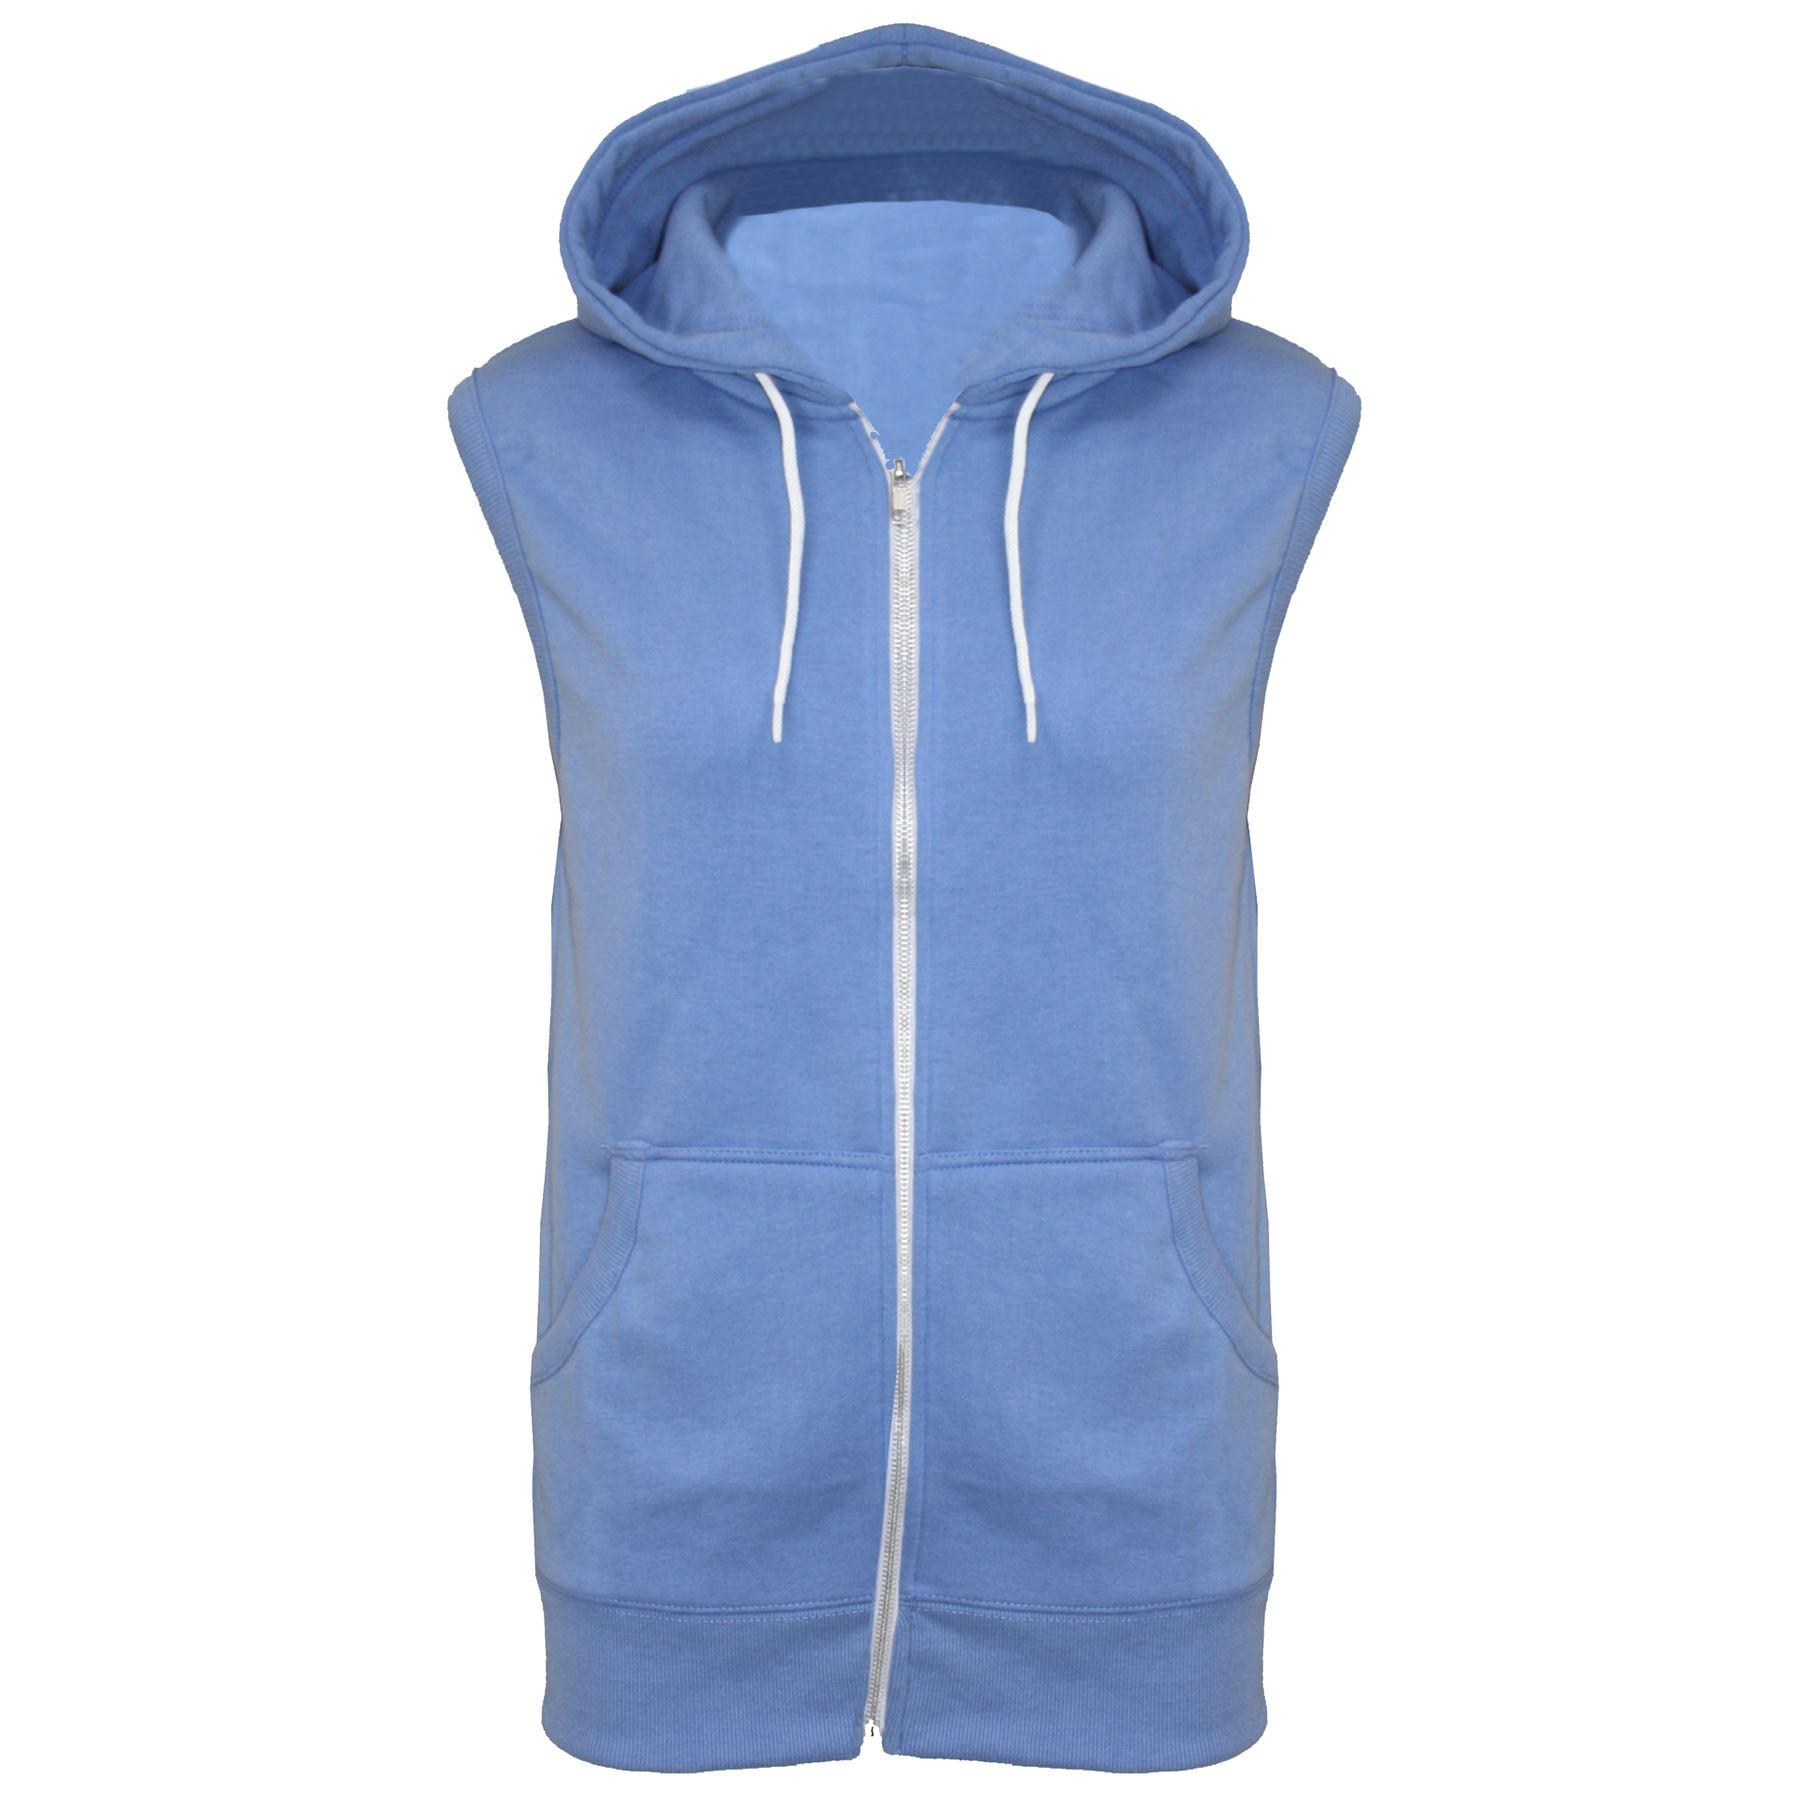 Mens sleeveless hoodies